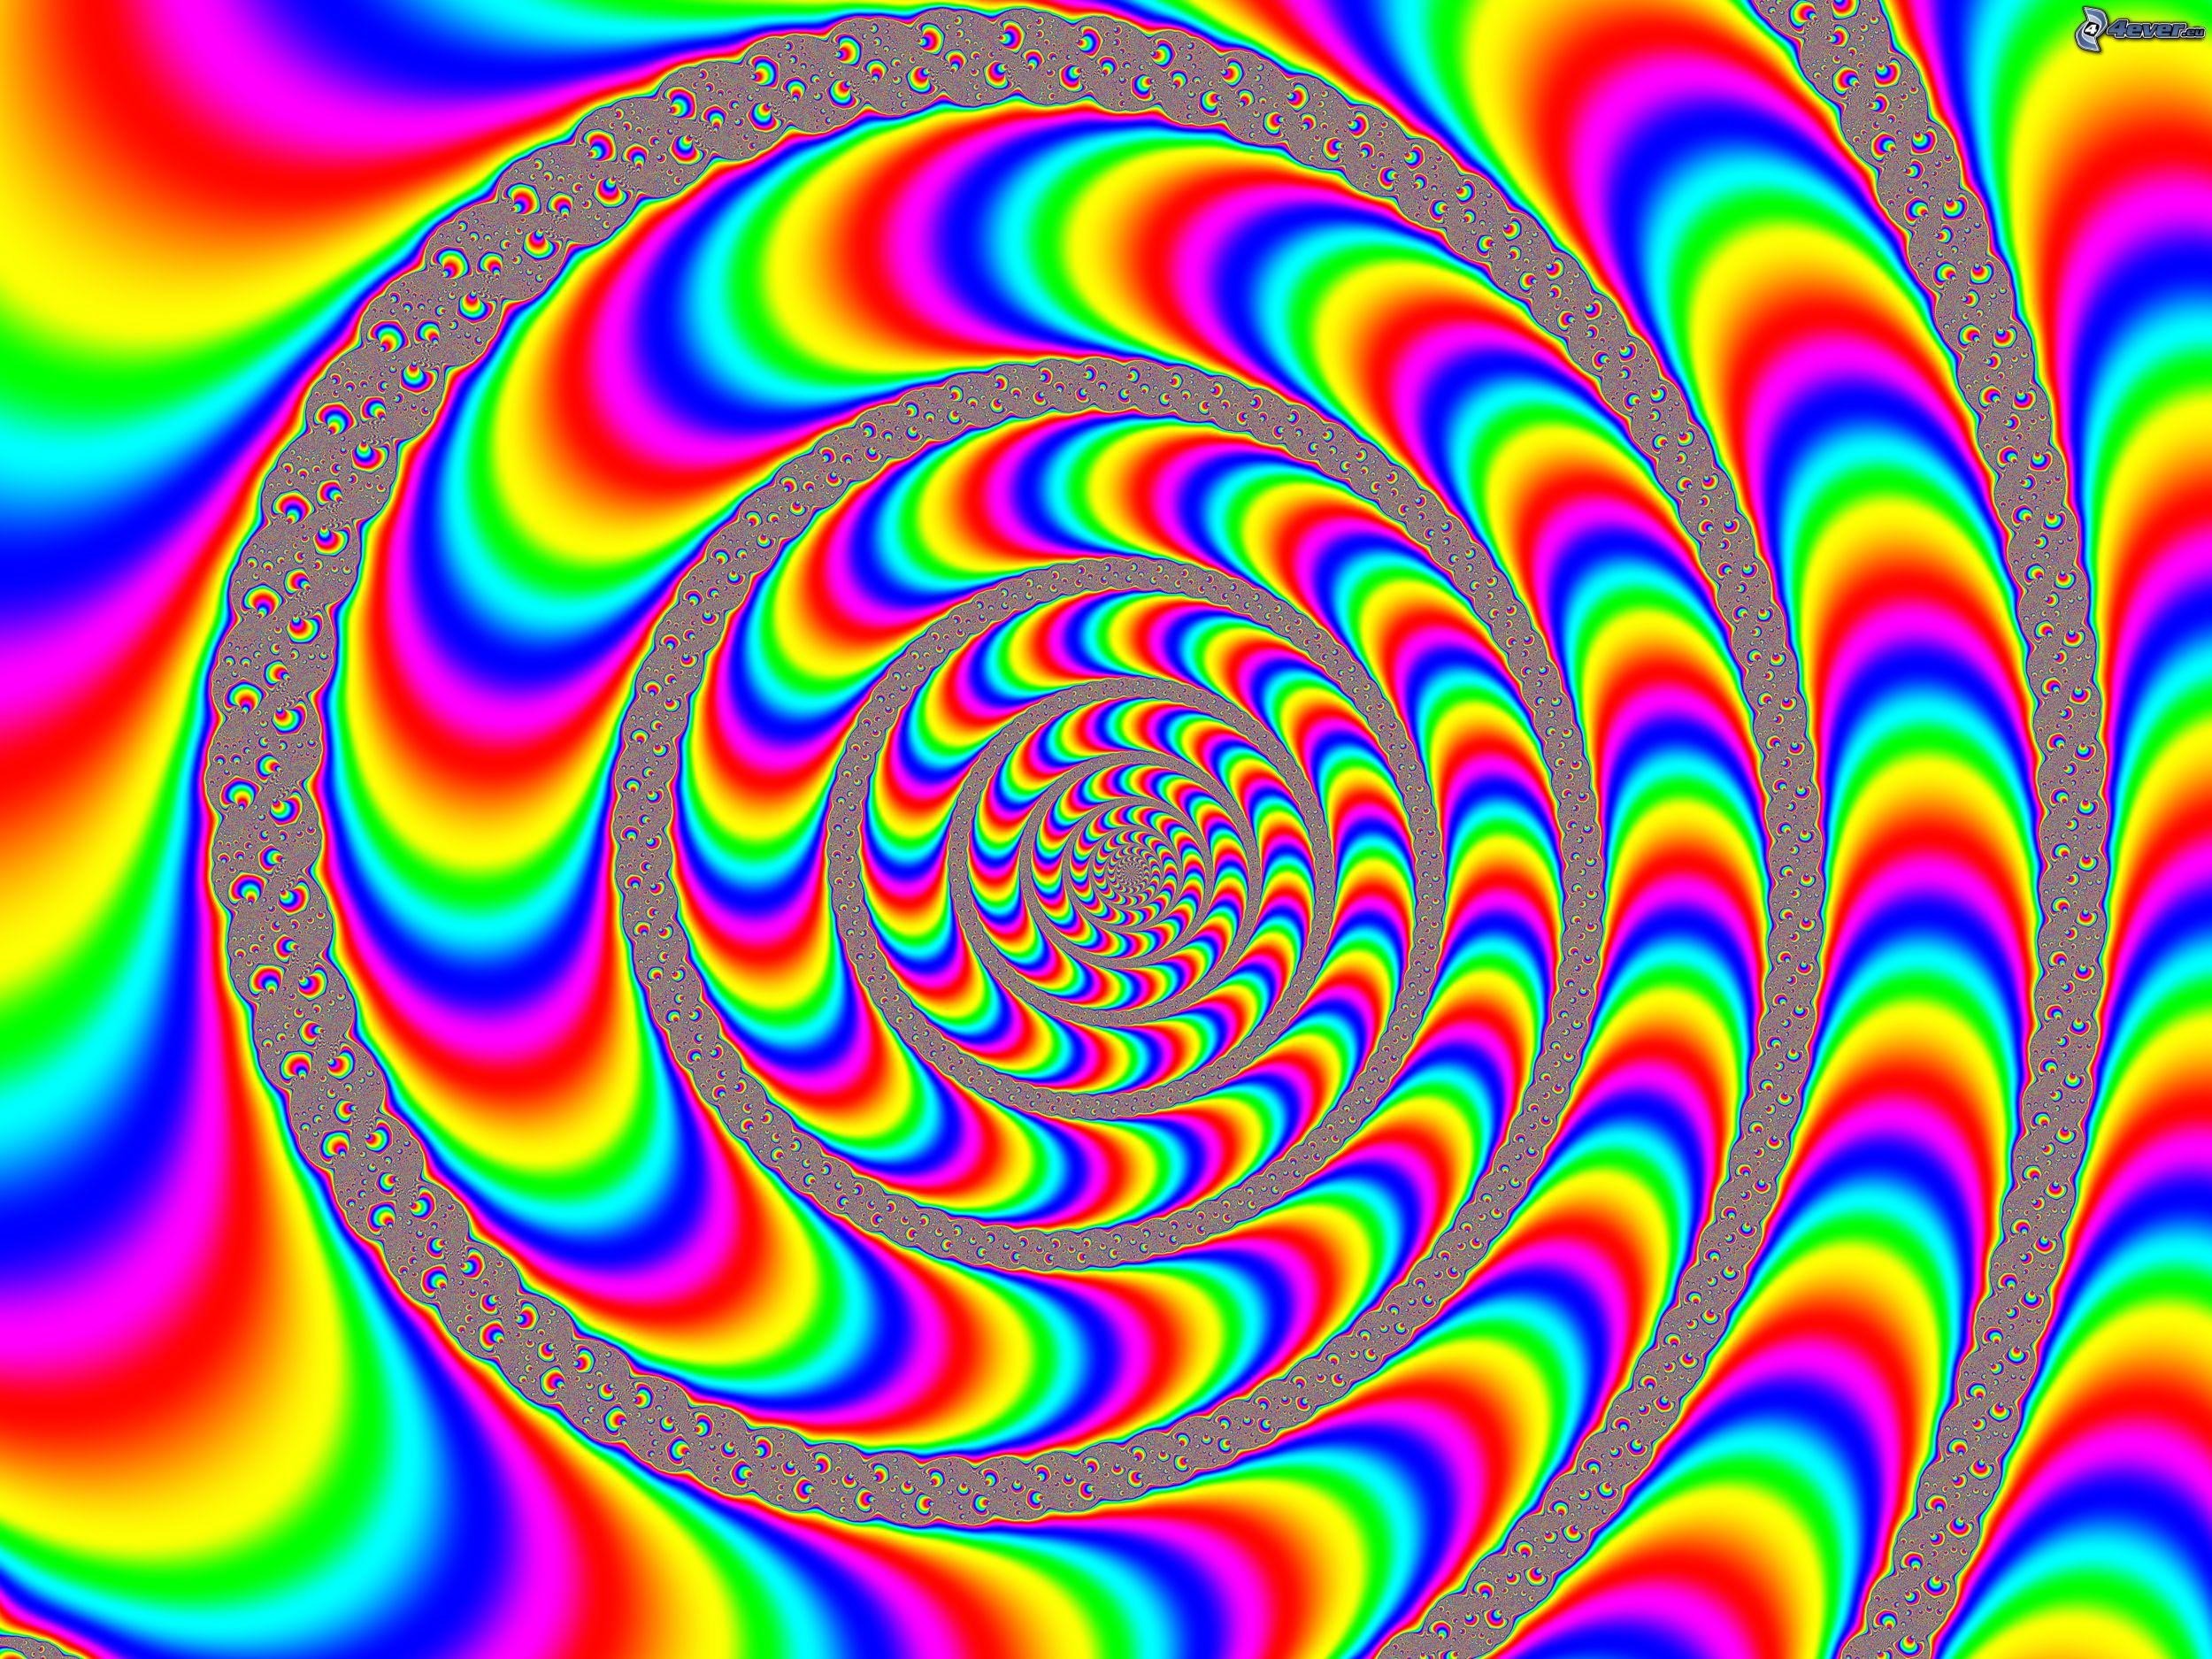 -pictures.4ever.eu- optical illusion, spiral 158747